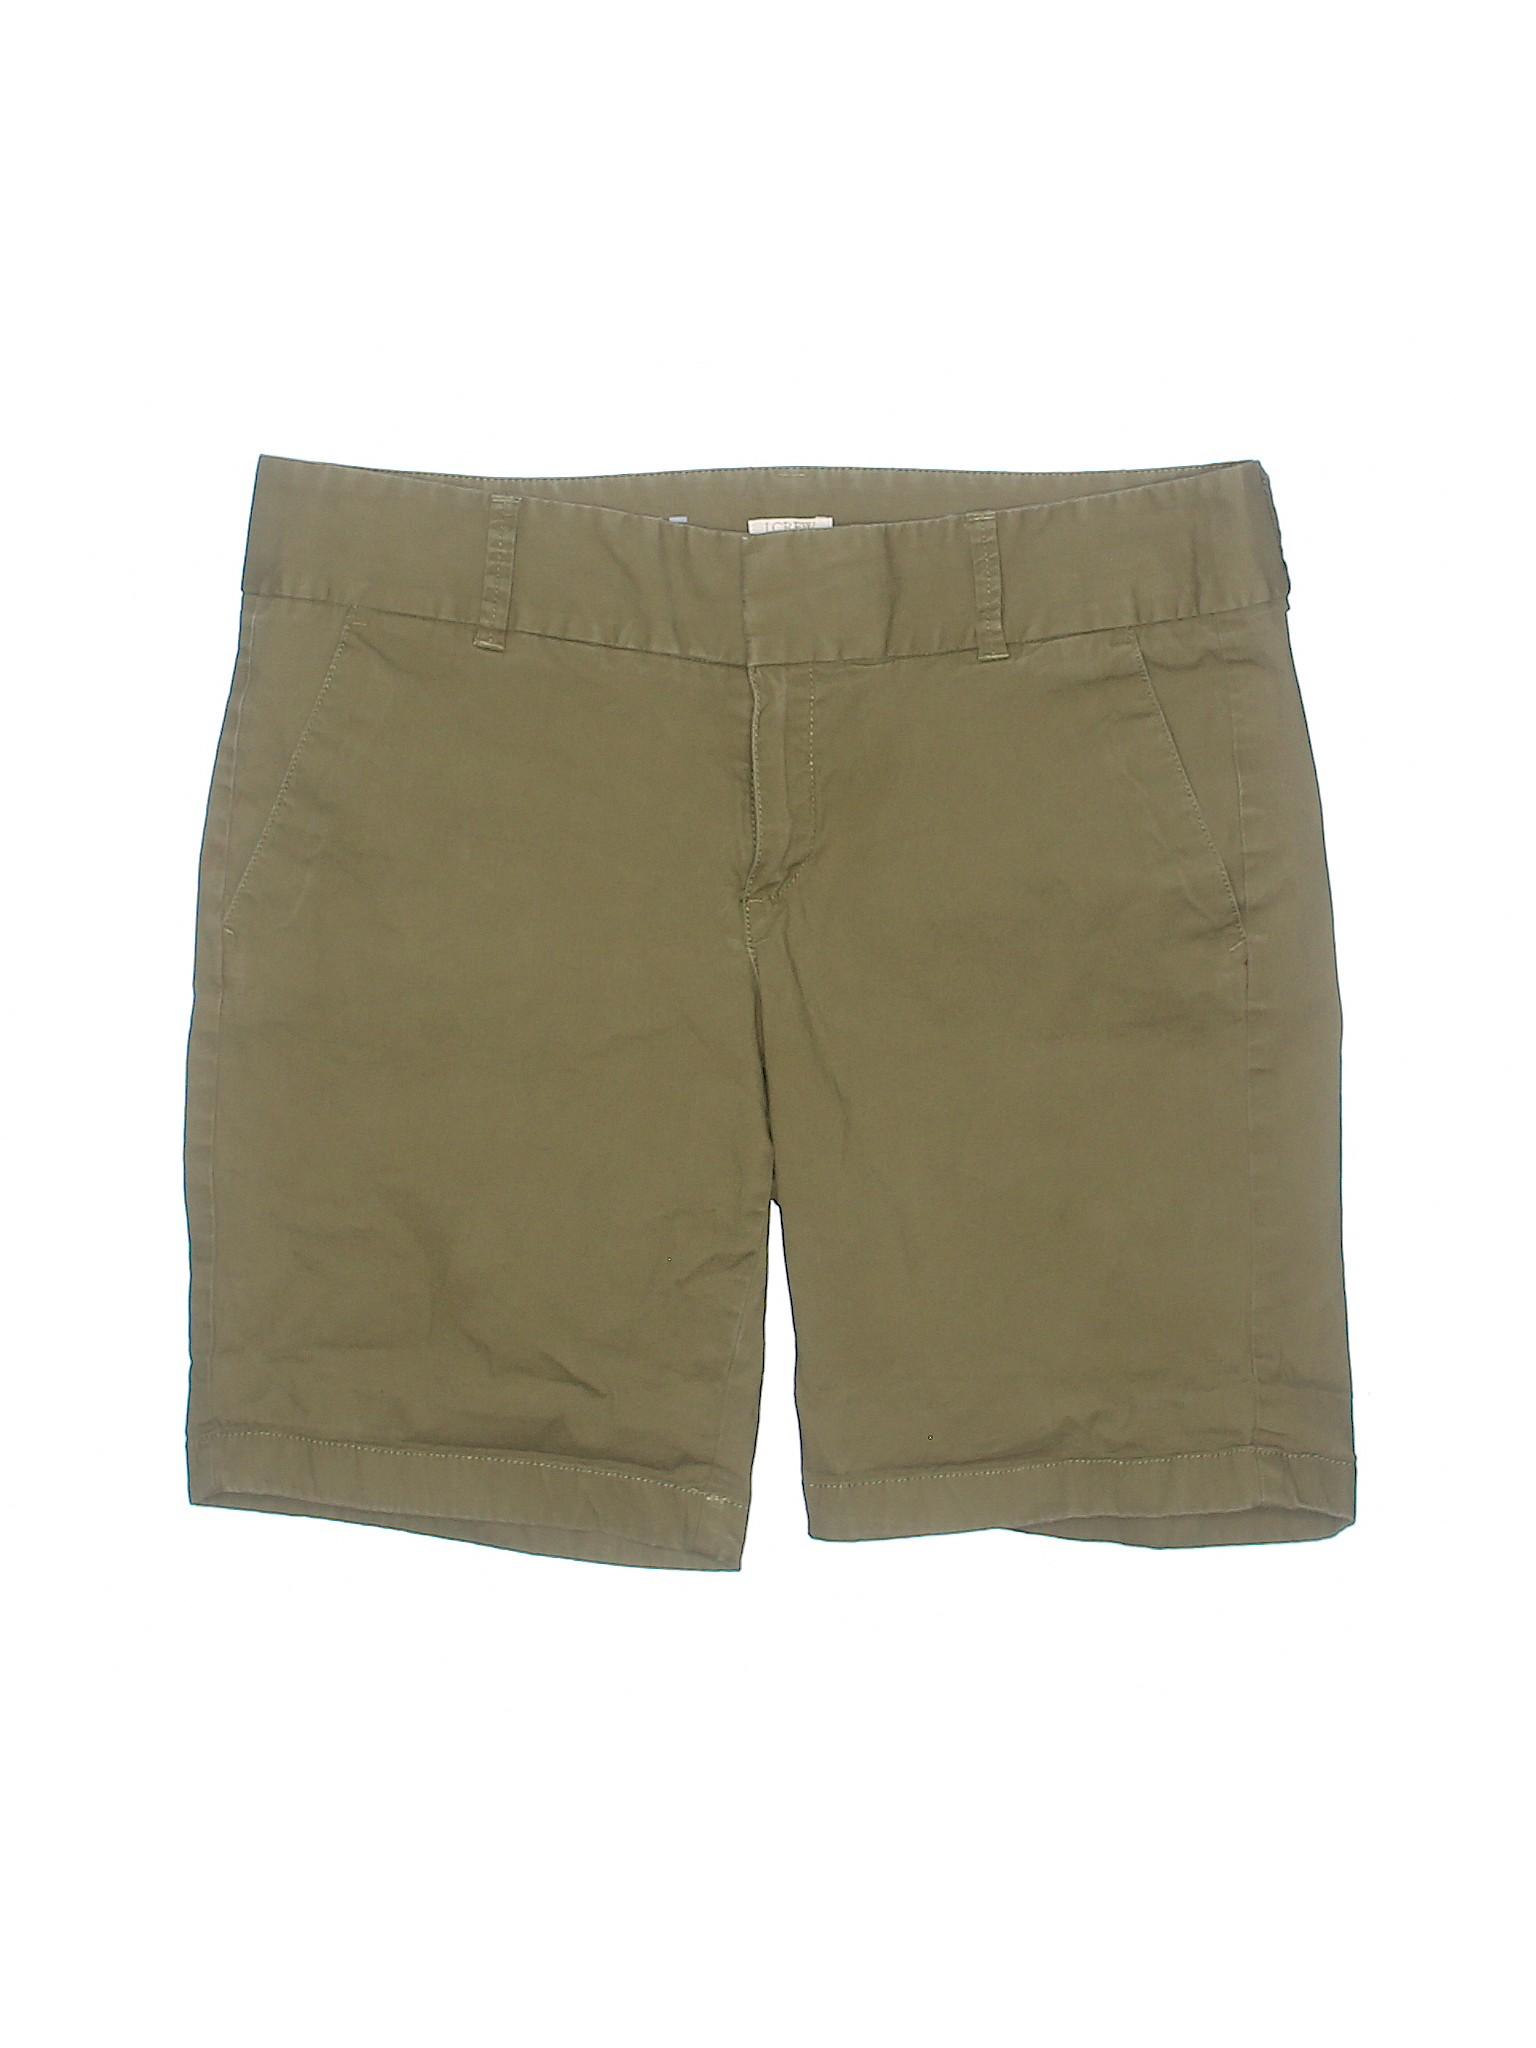 Khaki Boutique J Crew Shorts Crew Khaki Boutique Shorts J PxqdSP